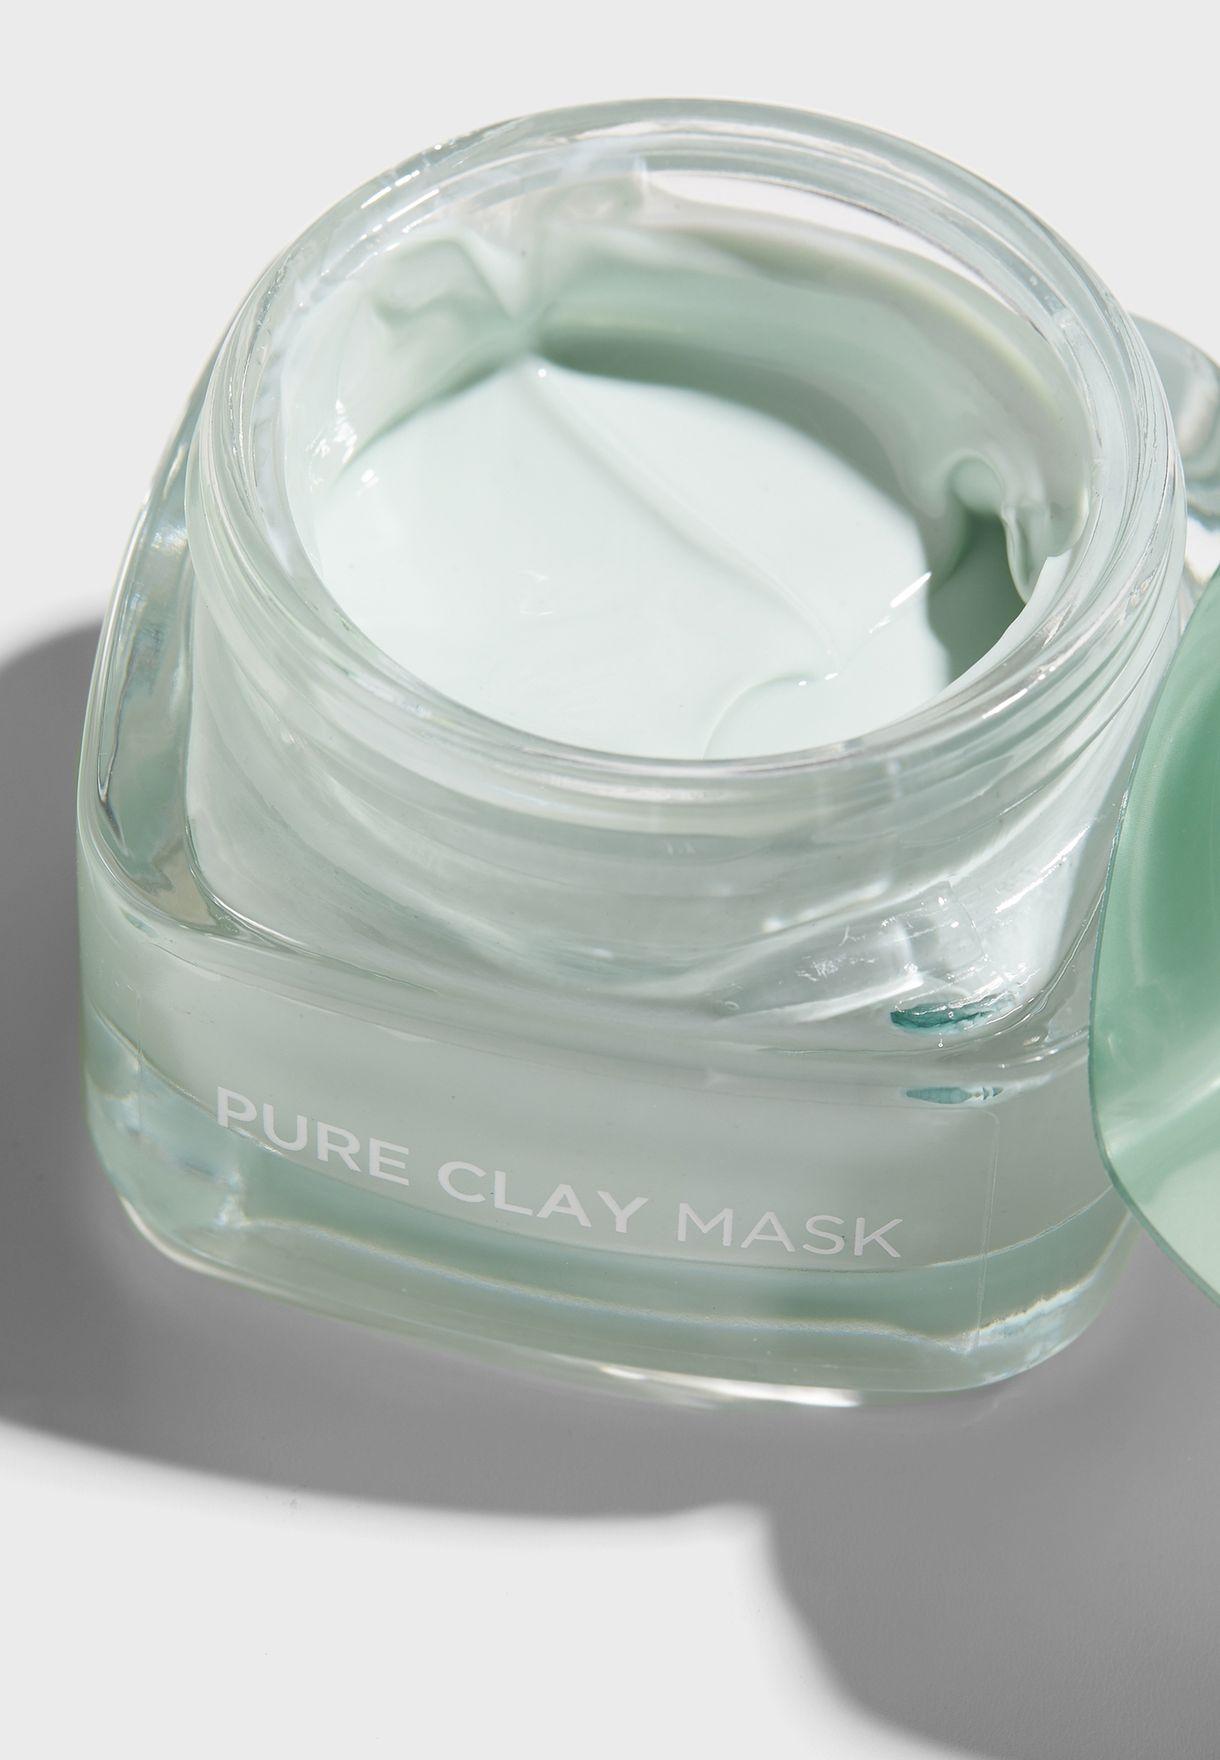 Pure Clay Euclayptus Mask + Cleanser Set worth 66 AED/SAR